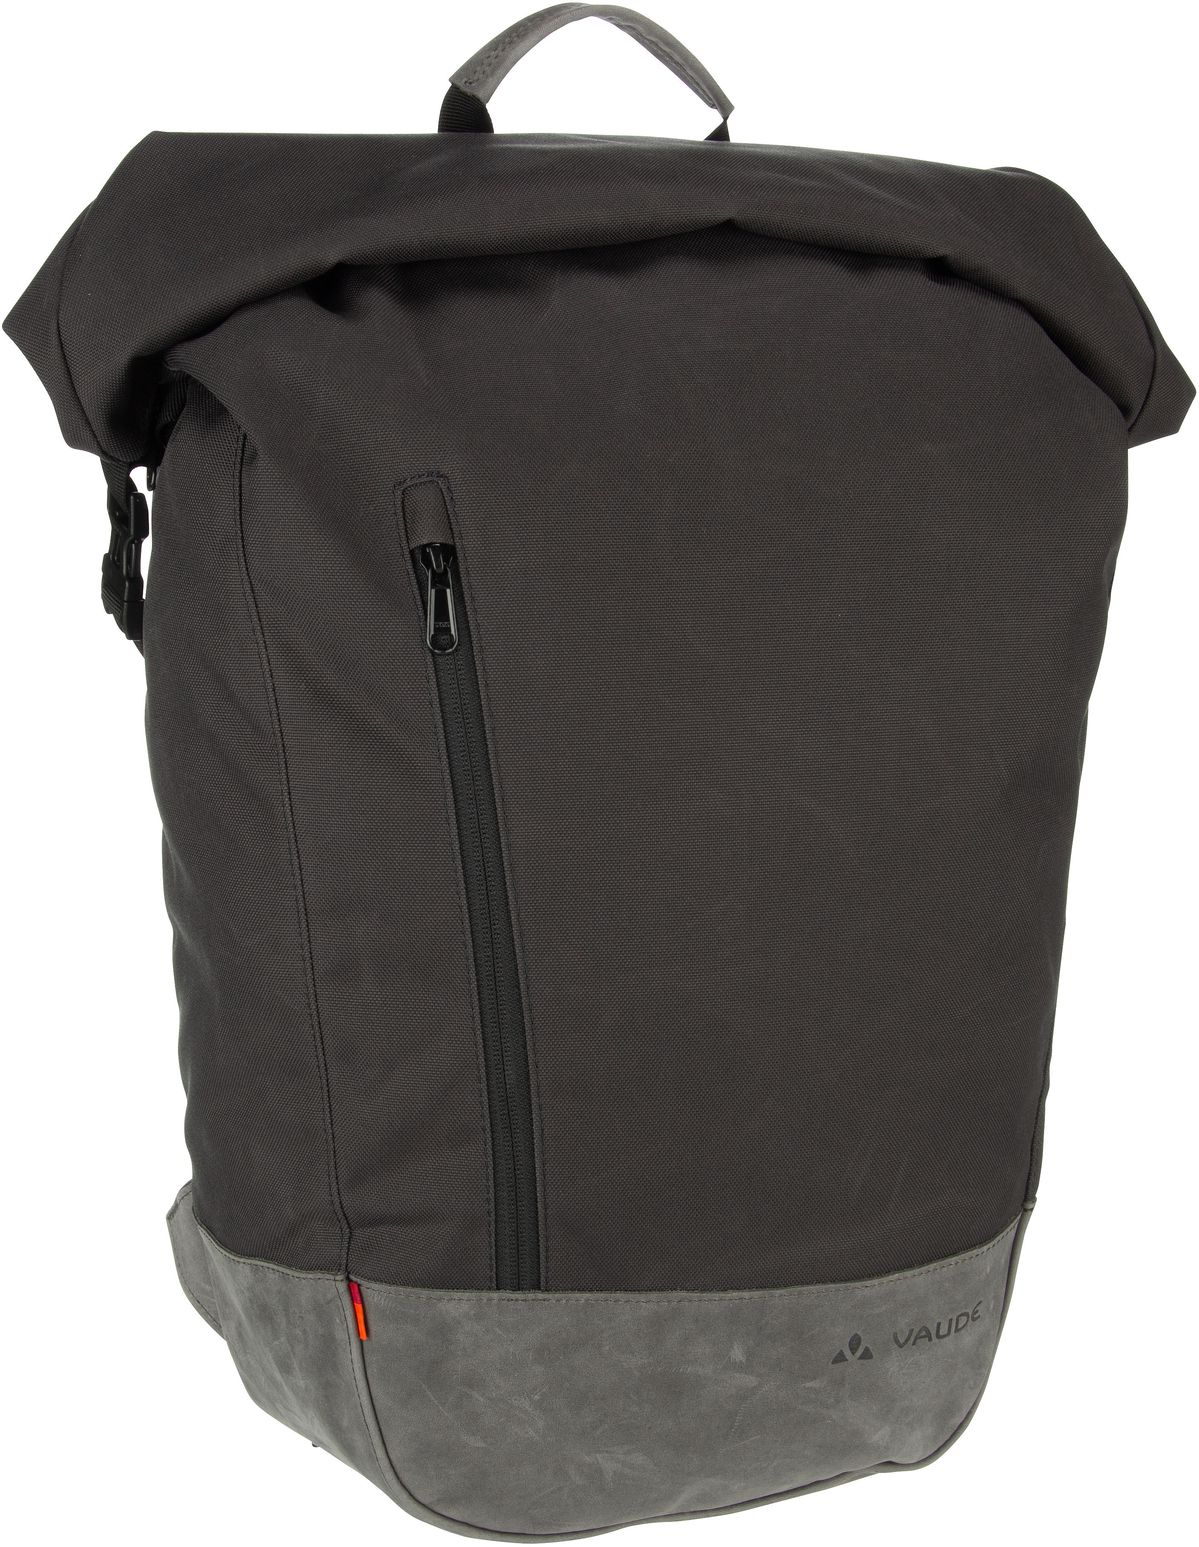 Rucksack / Daypack Enmore Phantom Black (22 Liter)